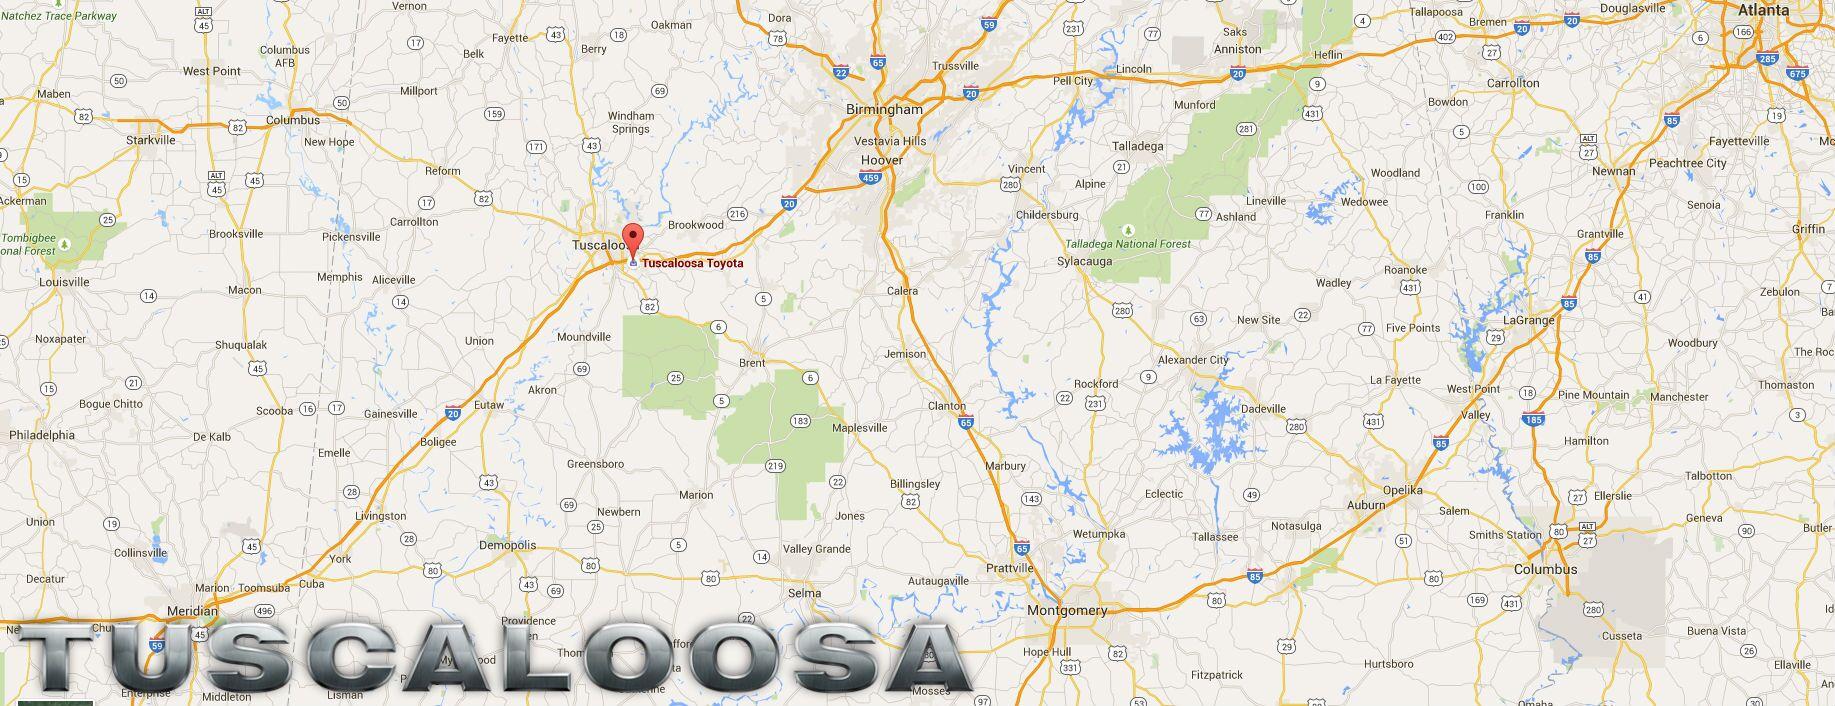 Tuscaloosa Toyota community involvement University of Alabama Easter Seals local schools organizations Tuscaloosa AL